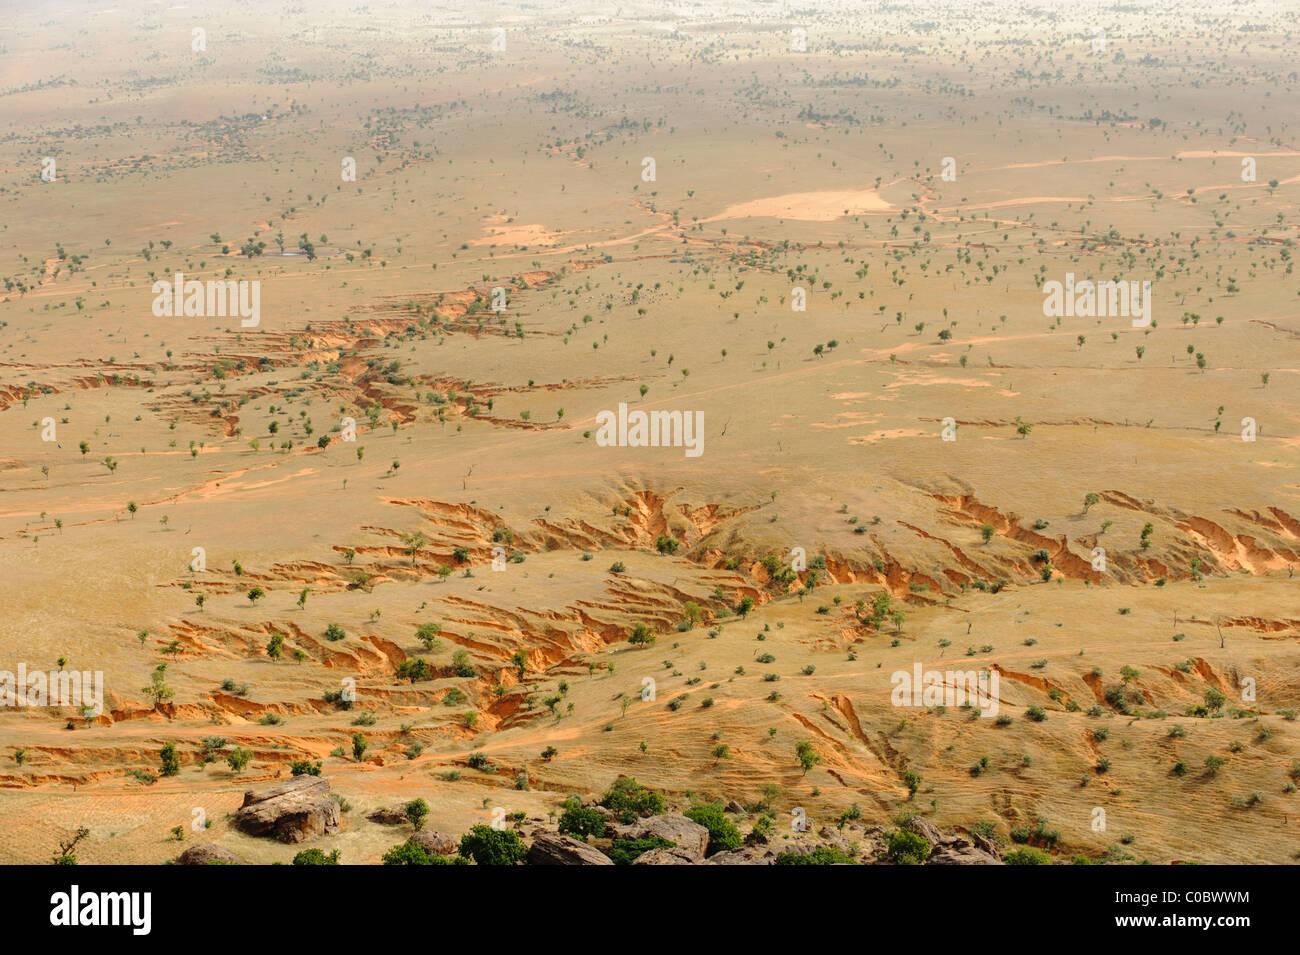 Gully erosion on the Gondo Plain, on the east side of Pays Dogon, Mali - Stock Image